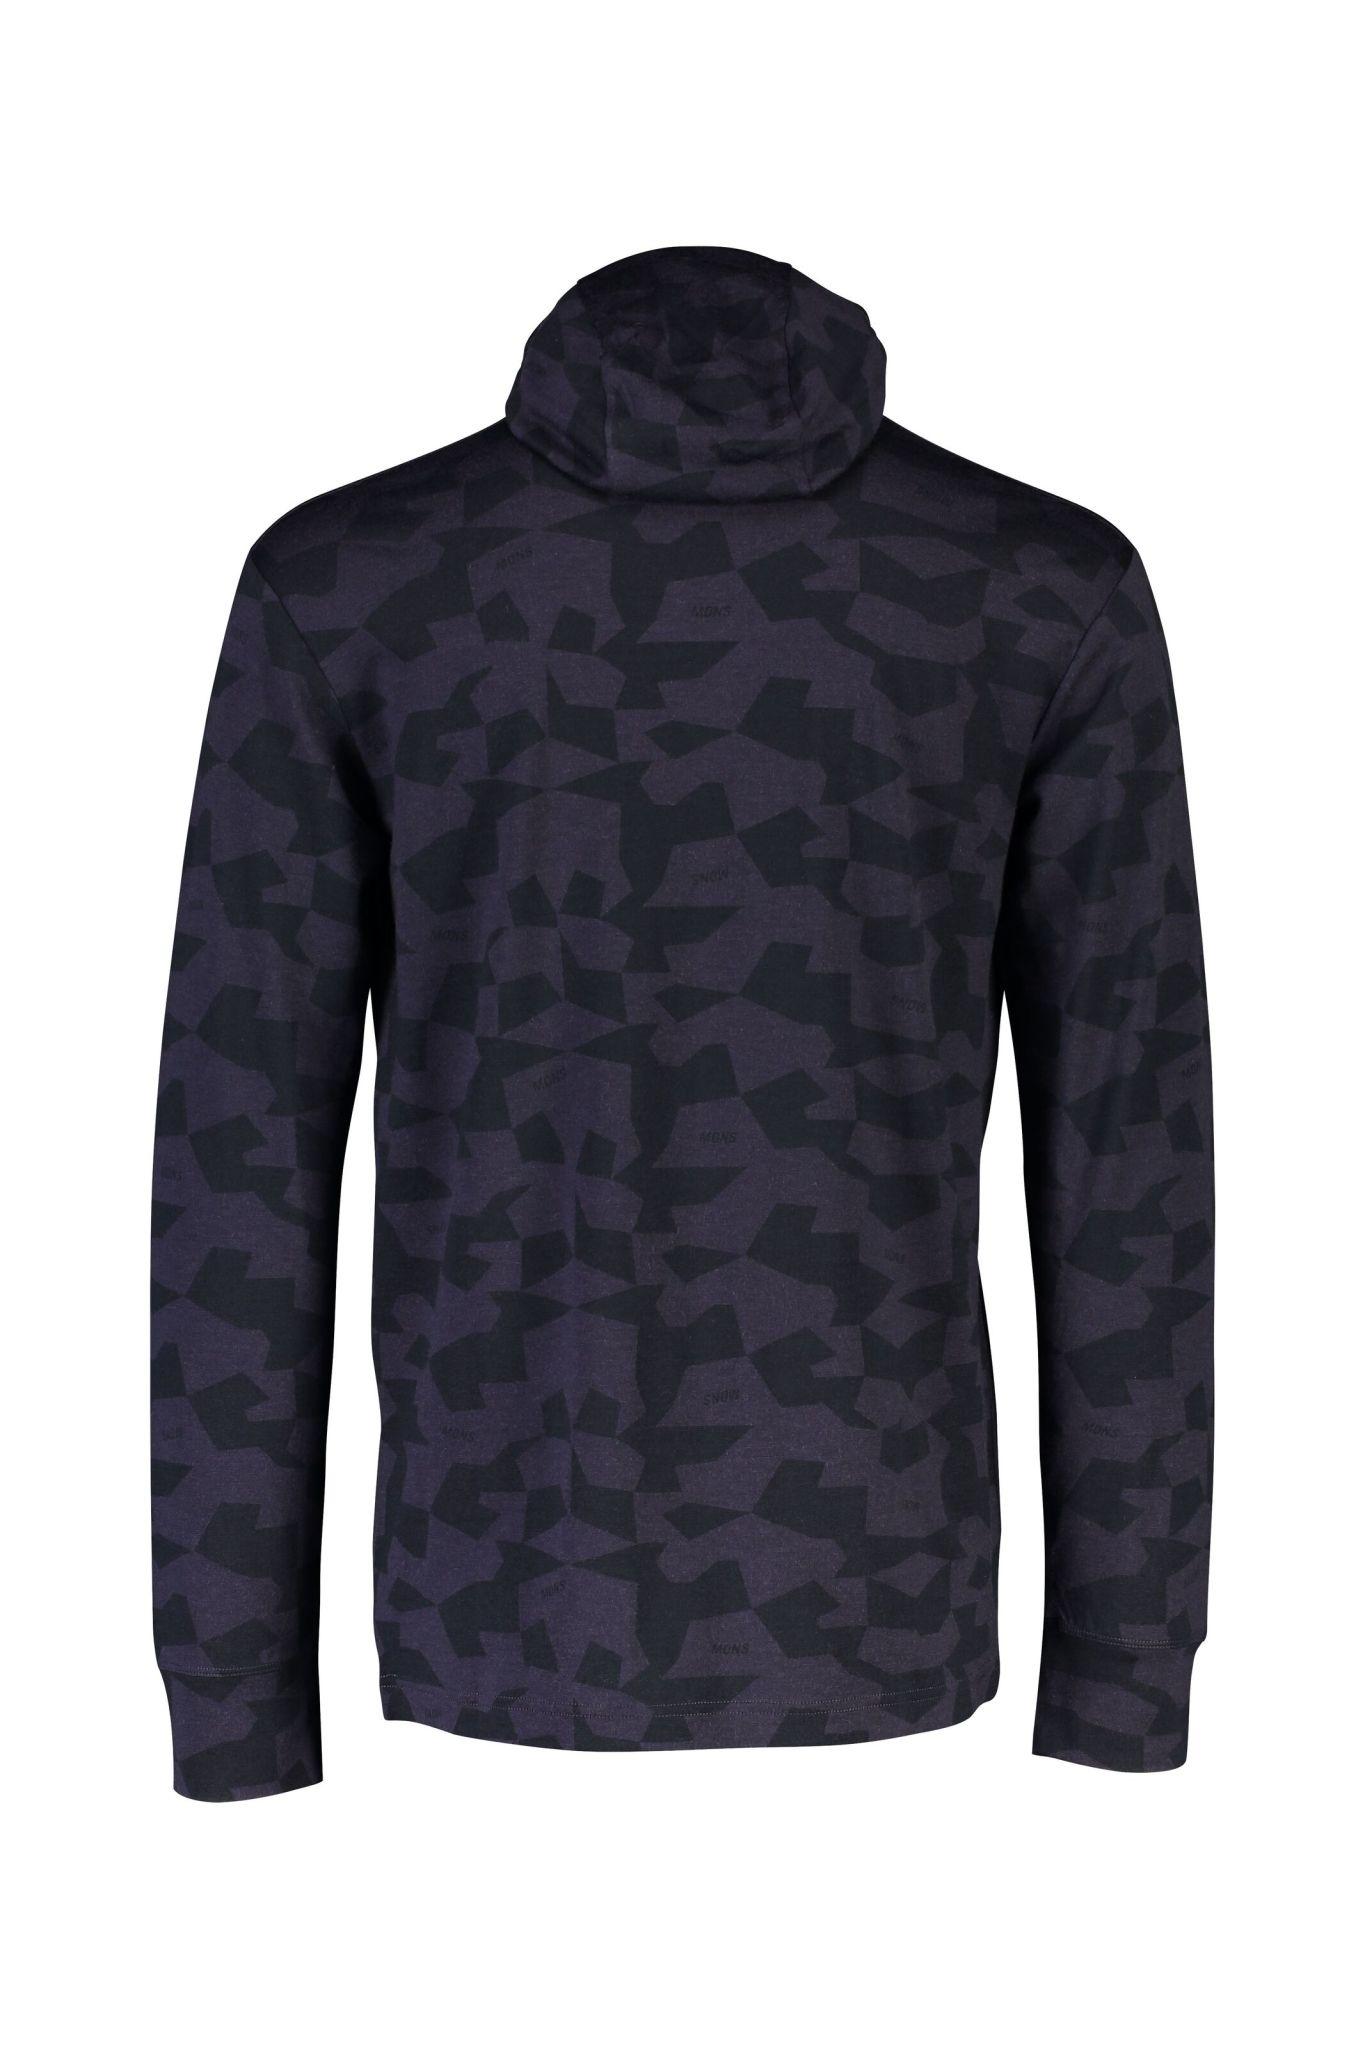 MONS ROYALE Mons Royale Men's Yotei Powder Hood LS Shirt